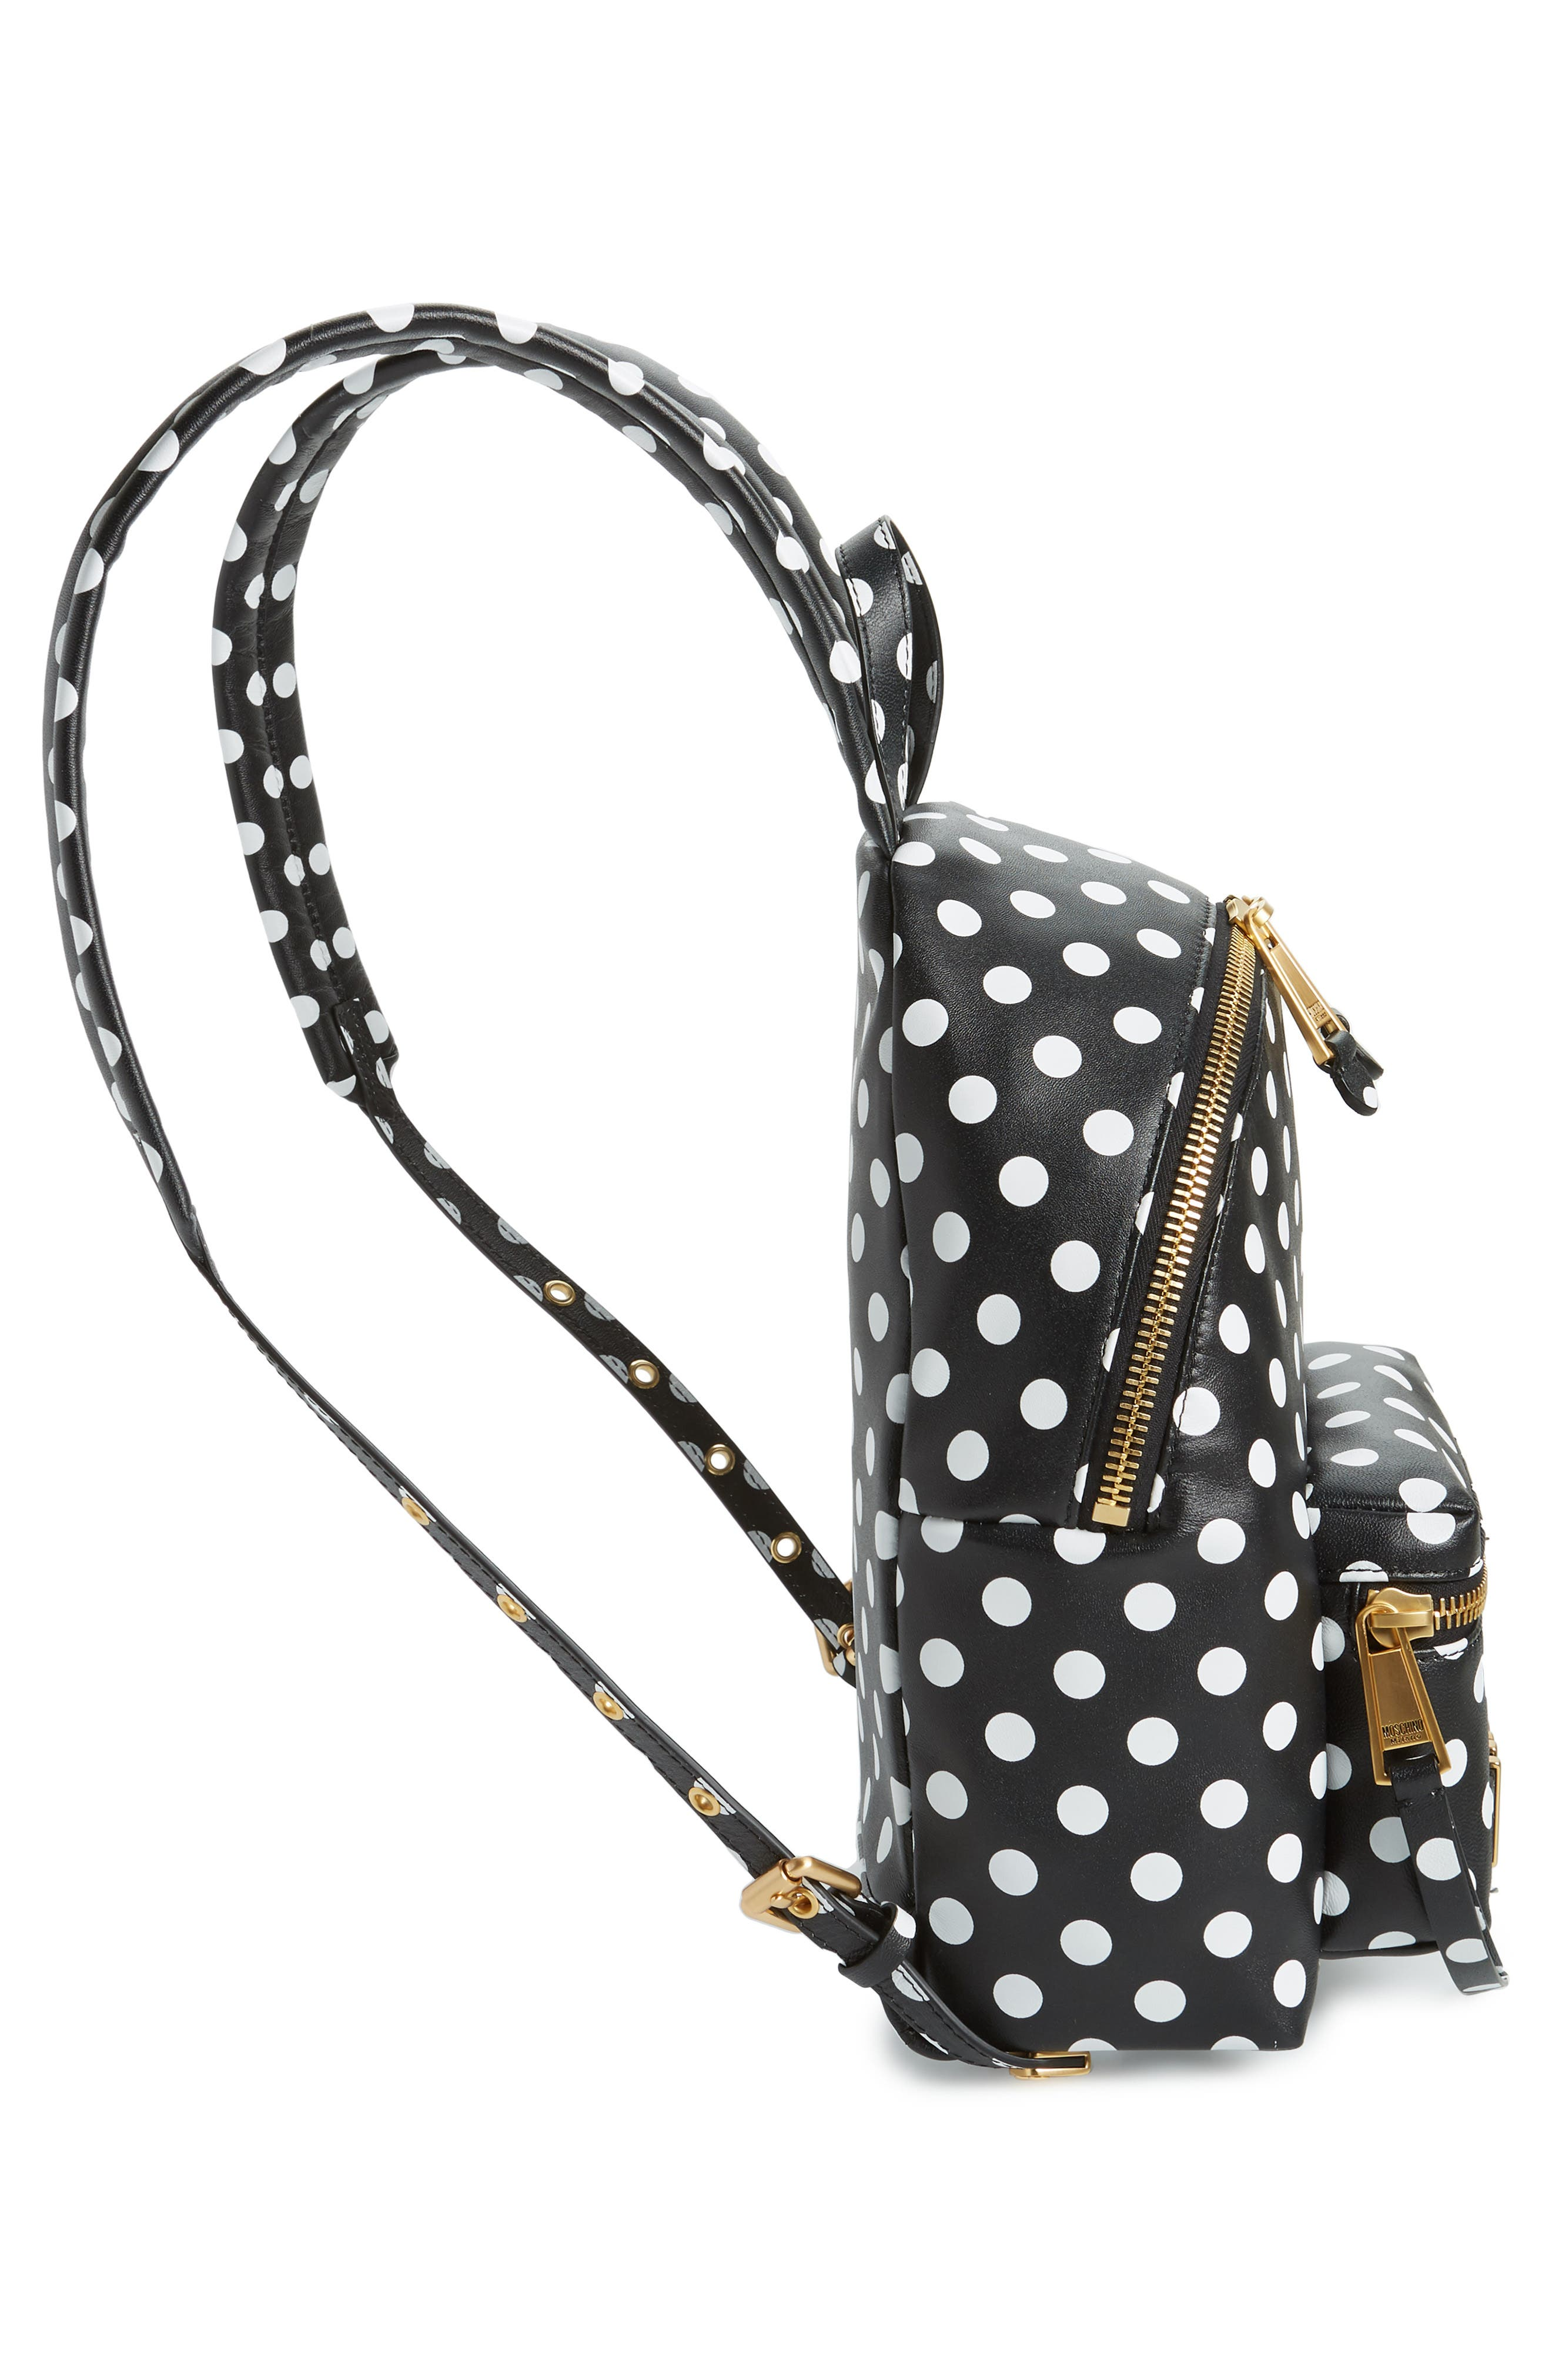 MOSCHINO, Logo Polka Dot Backpack, Alternate thumbnail 5, color, BLACK/ WHITE